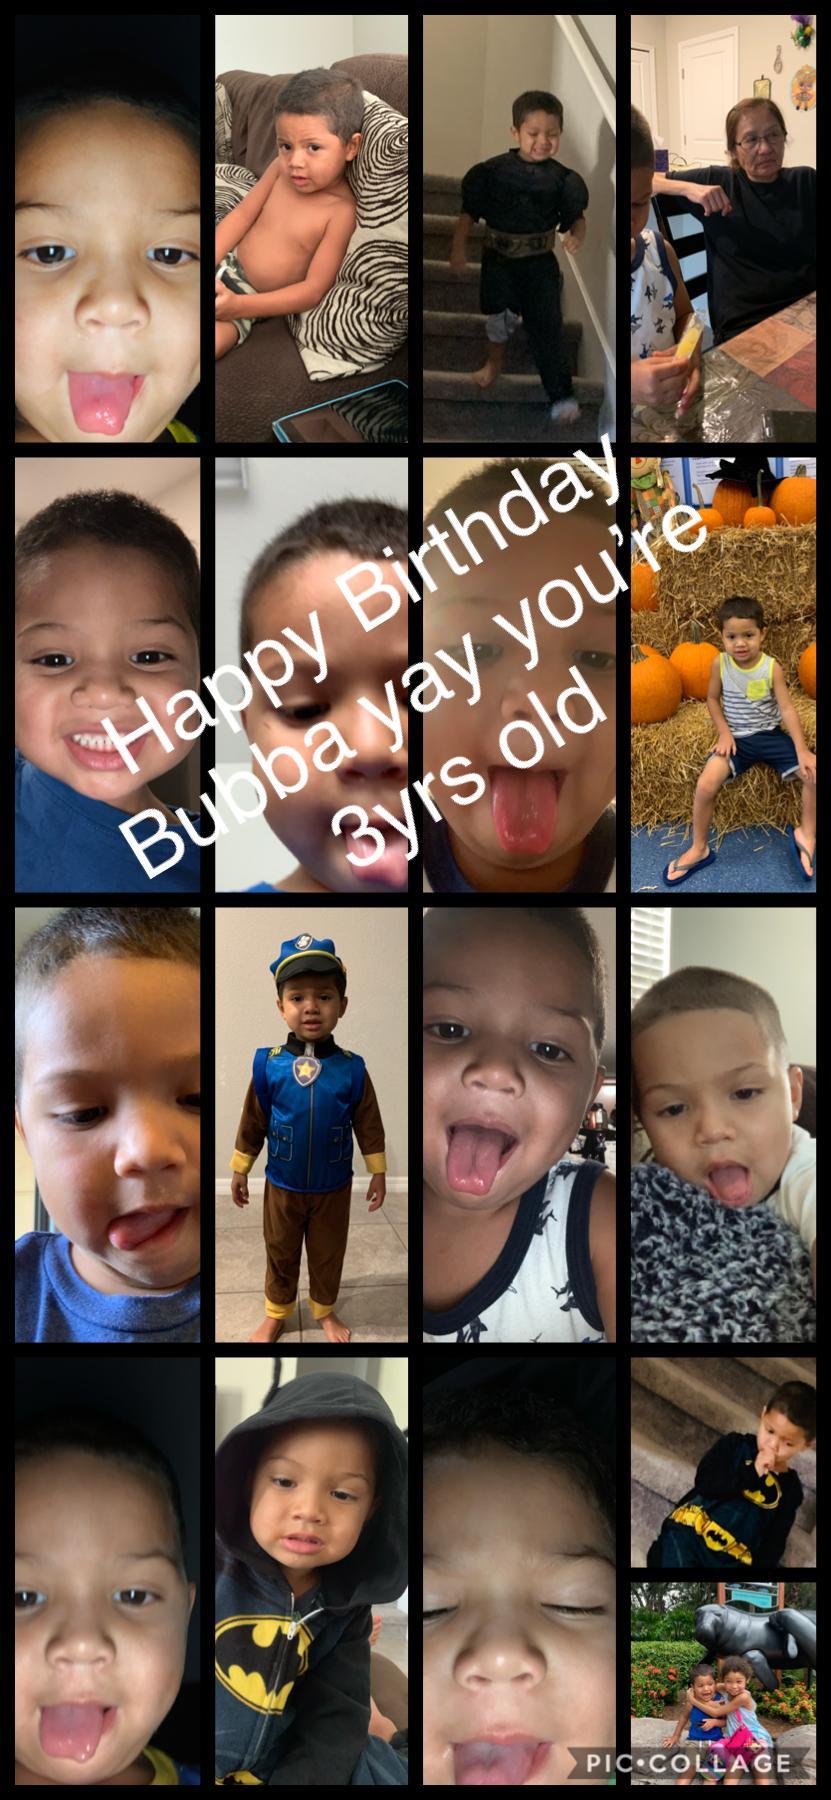 Happy Birthday Bubba yay you're 3yrs old